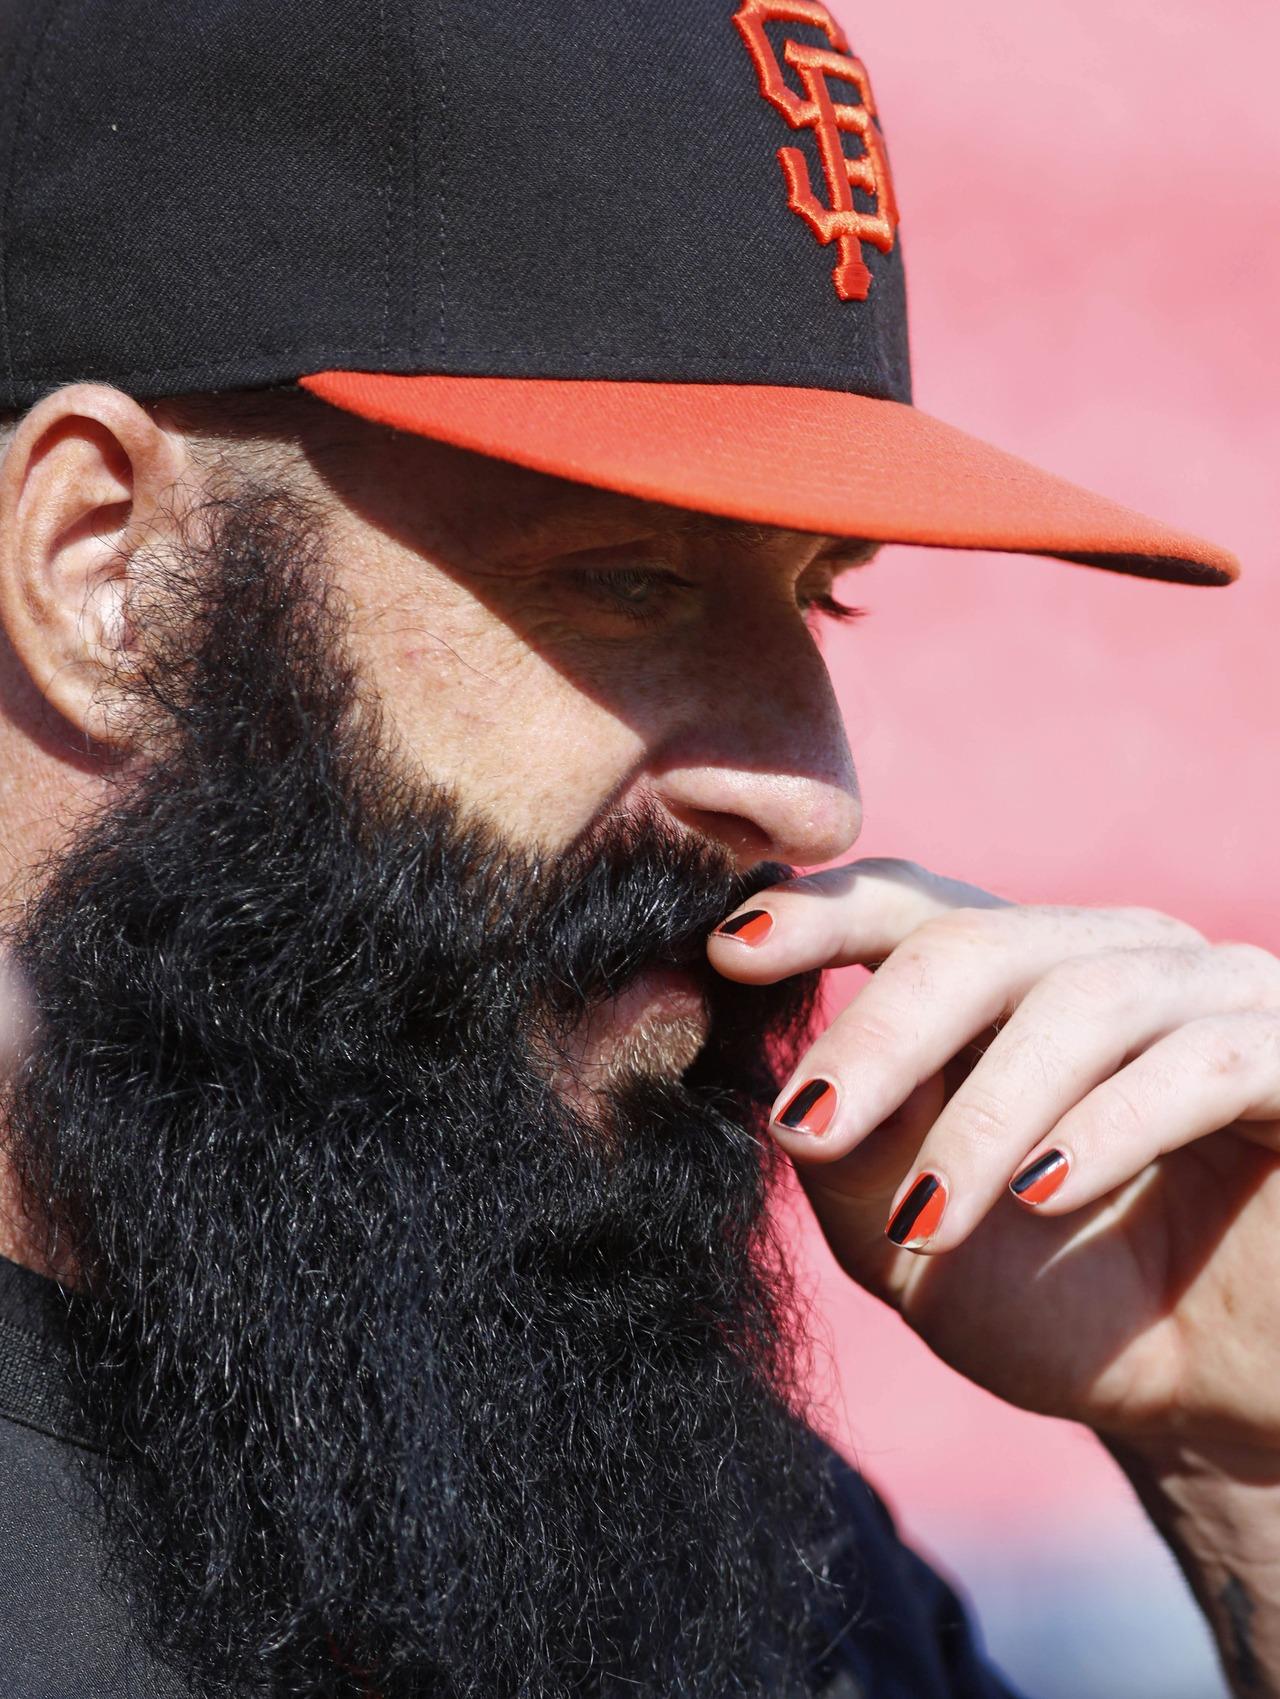 Tendencia: Nail polish para hombres…¿Te animas? | Adrix Nails: Uñas ...